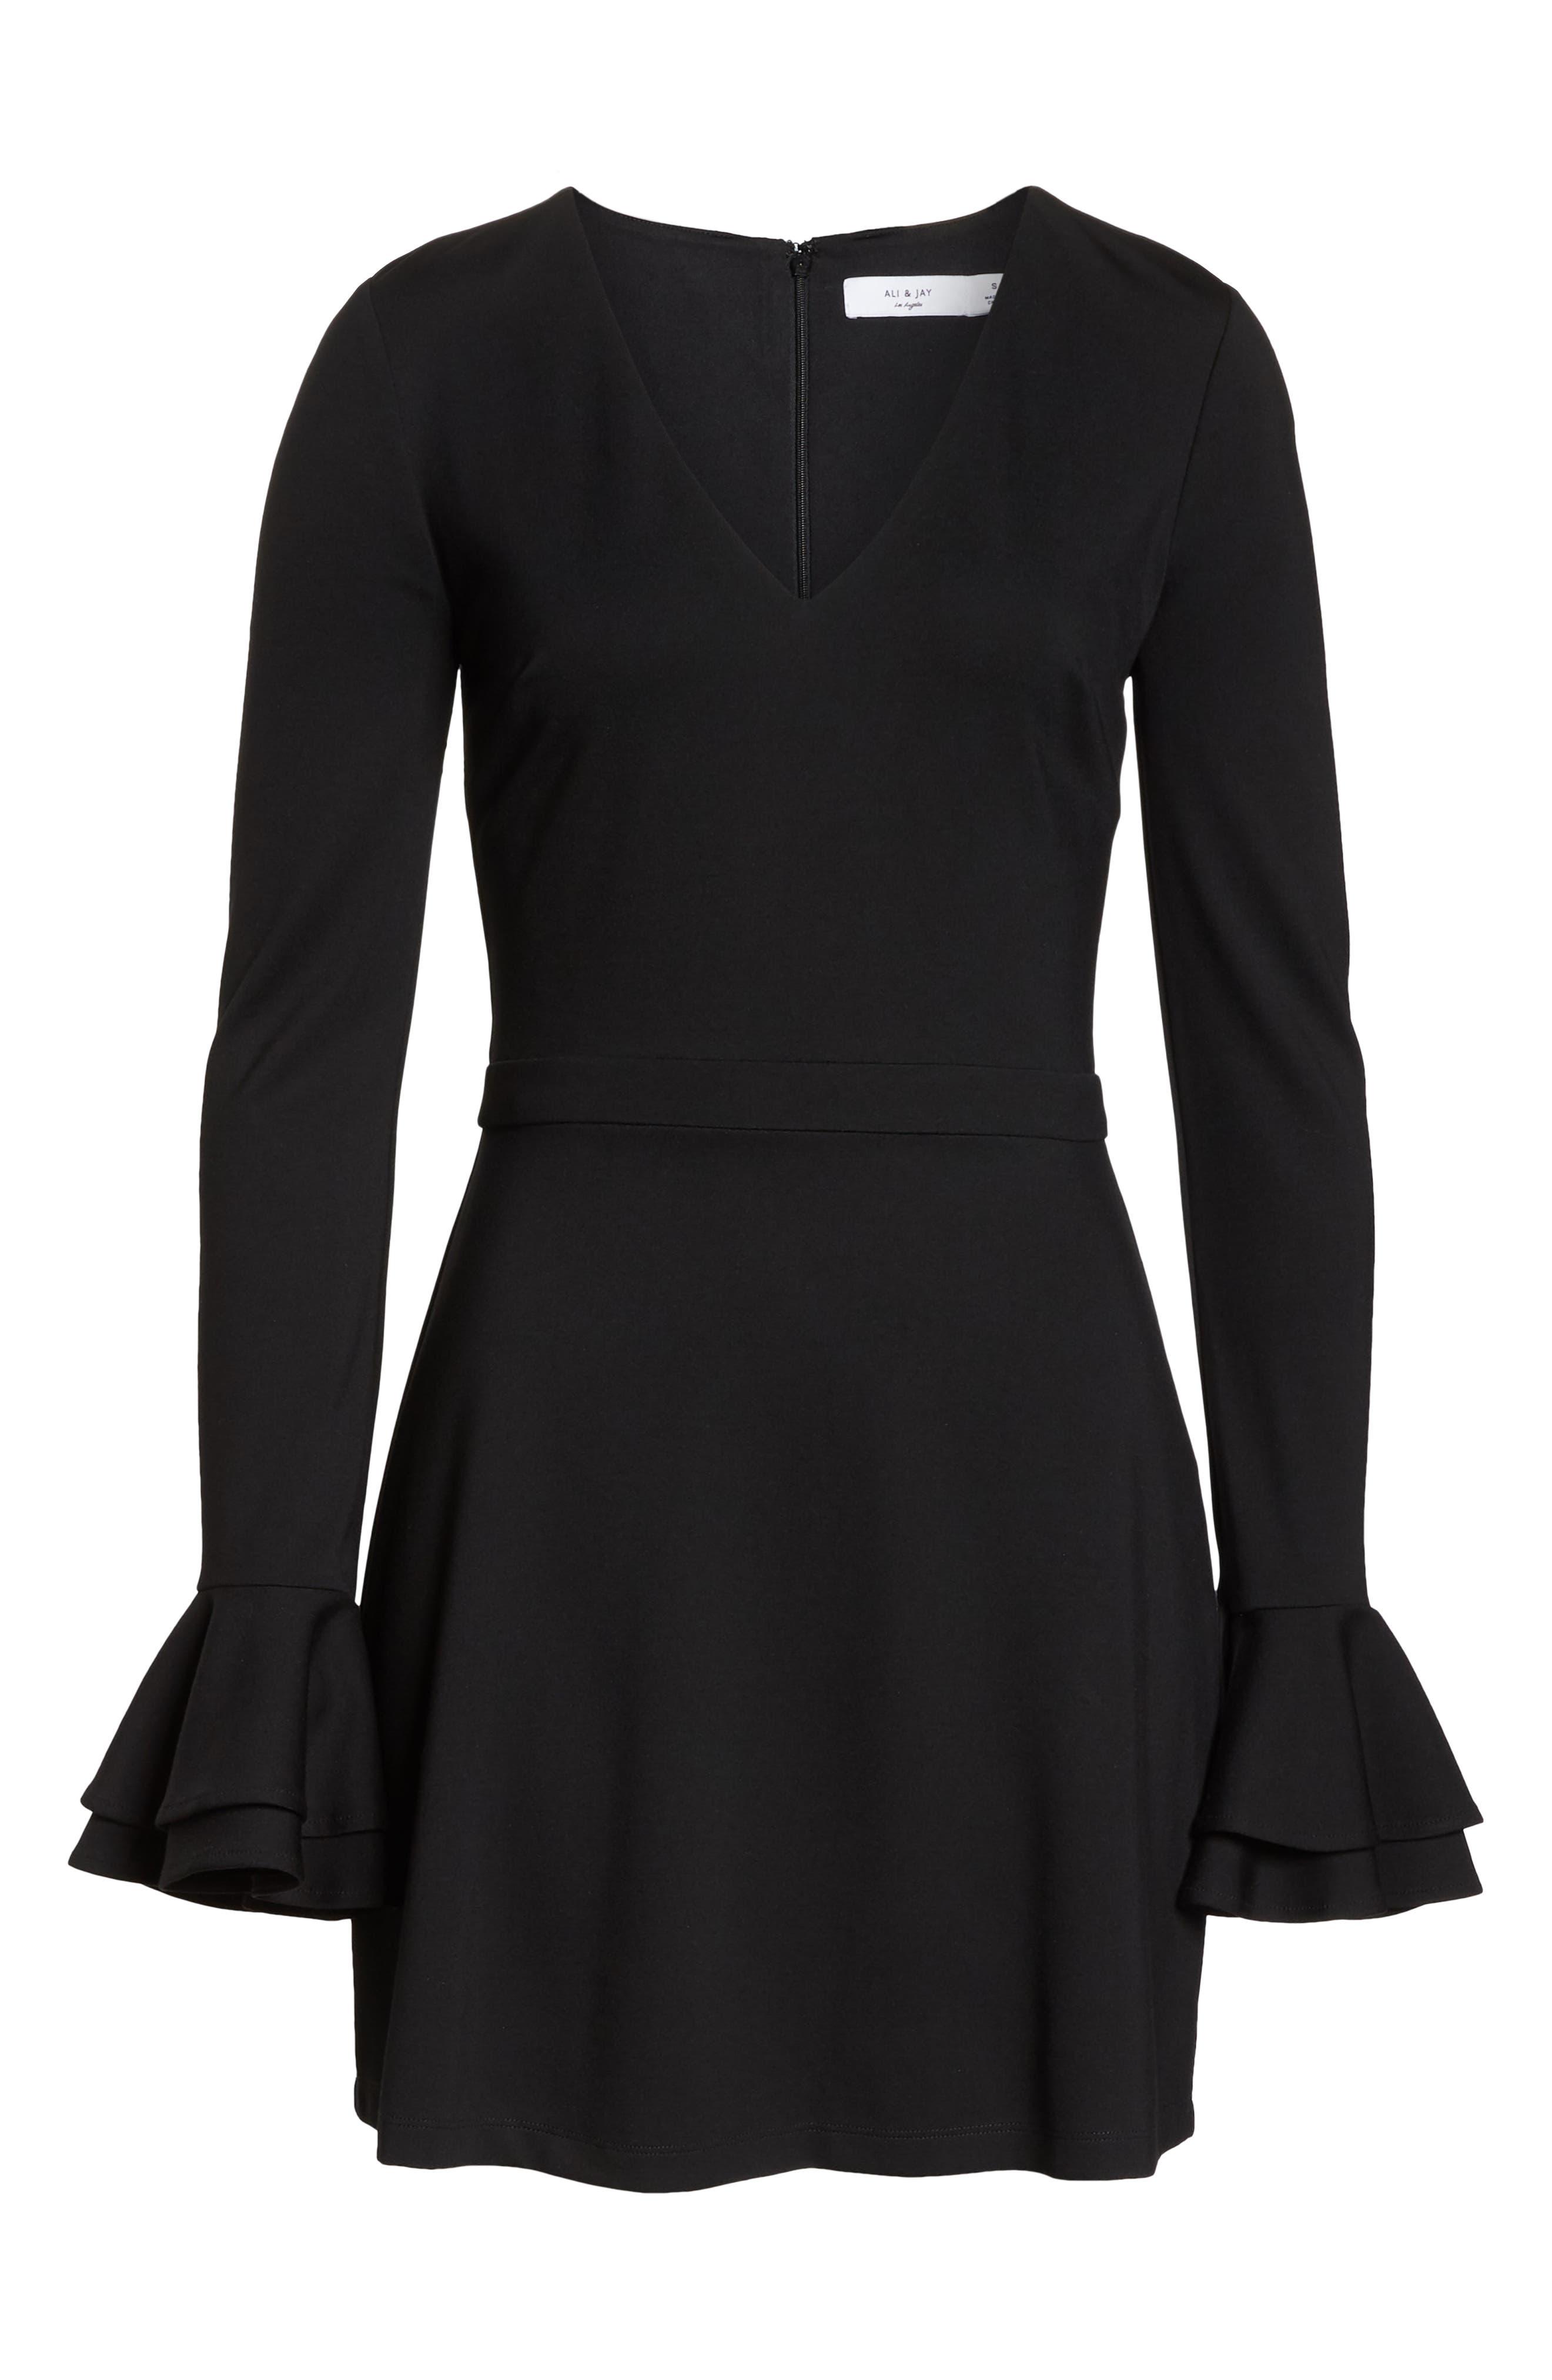 ALI & JAY, Still Waiting Fit & Flare Dress, Alternate thumbnail 7, color, BLACK